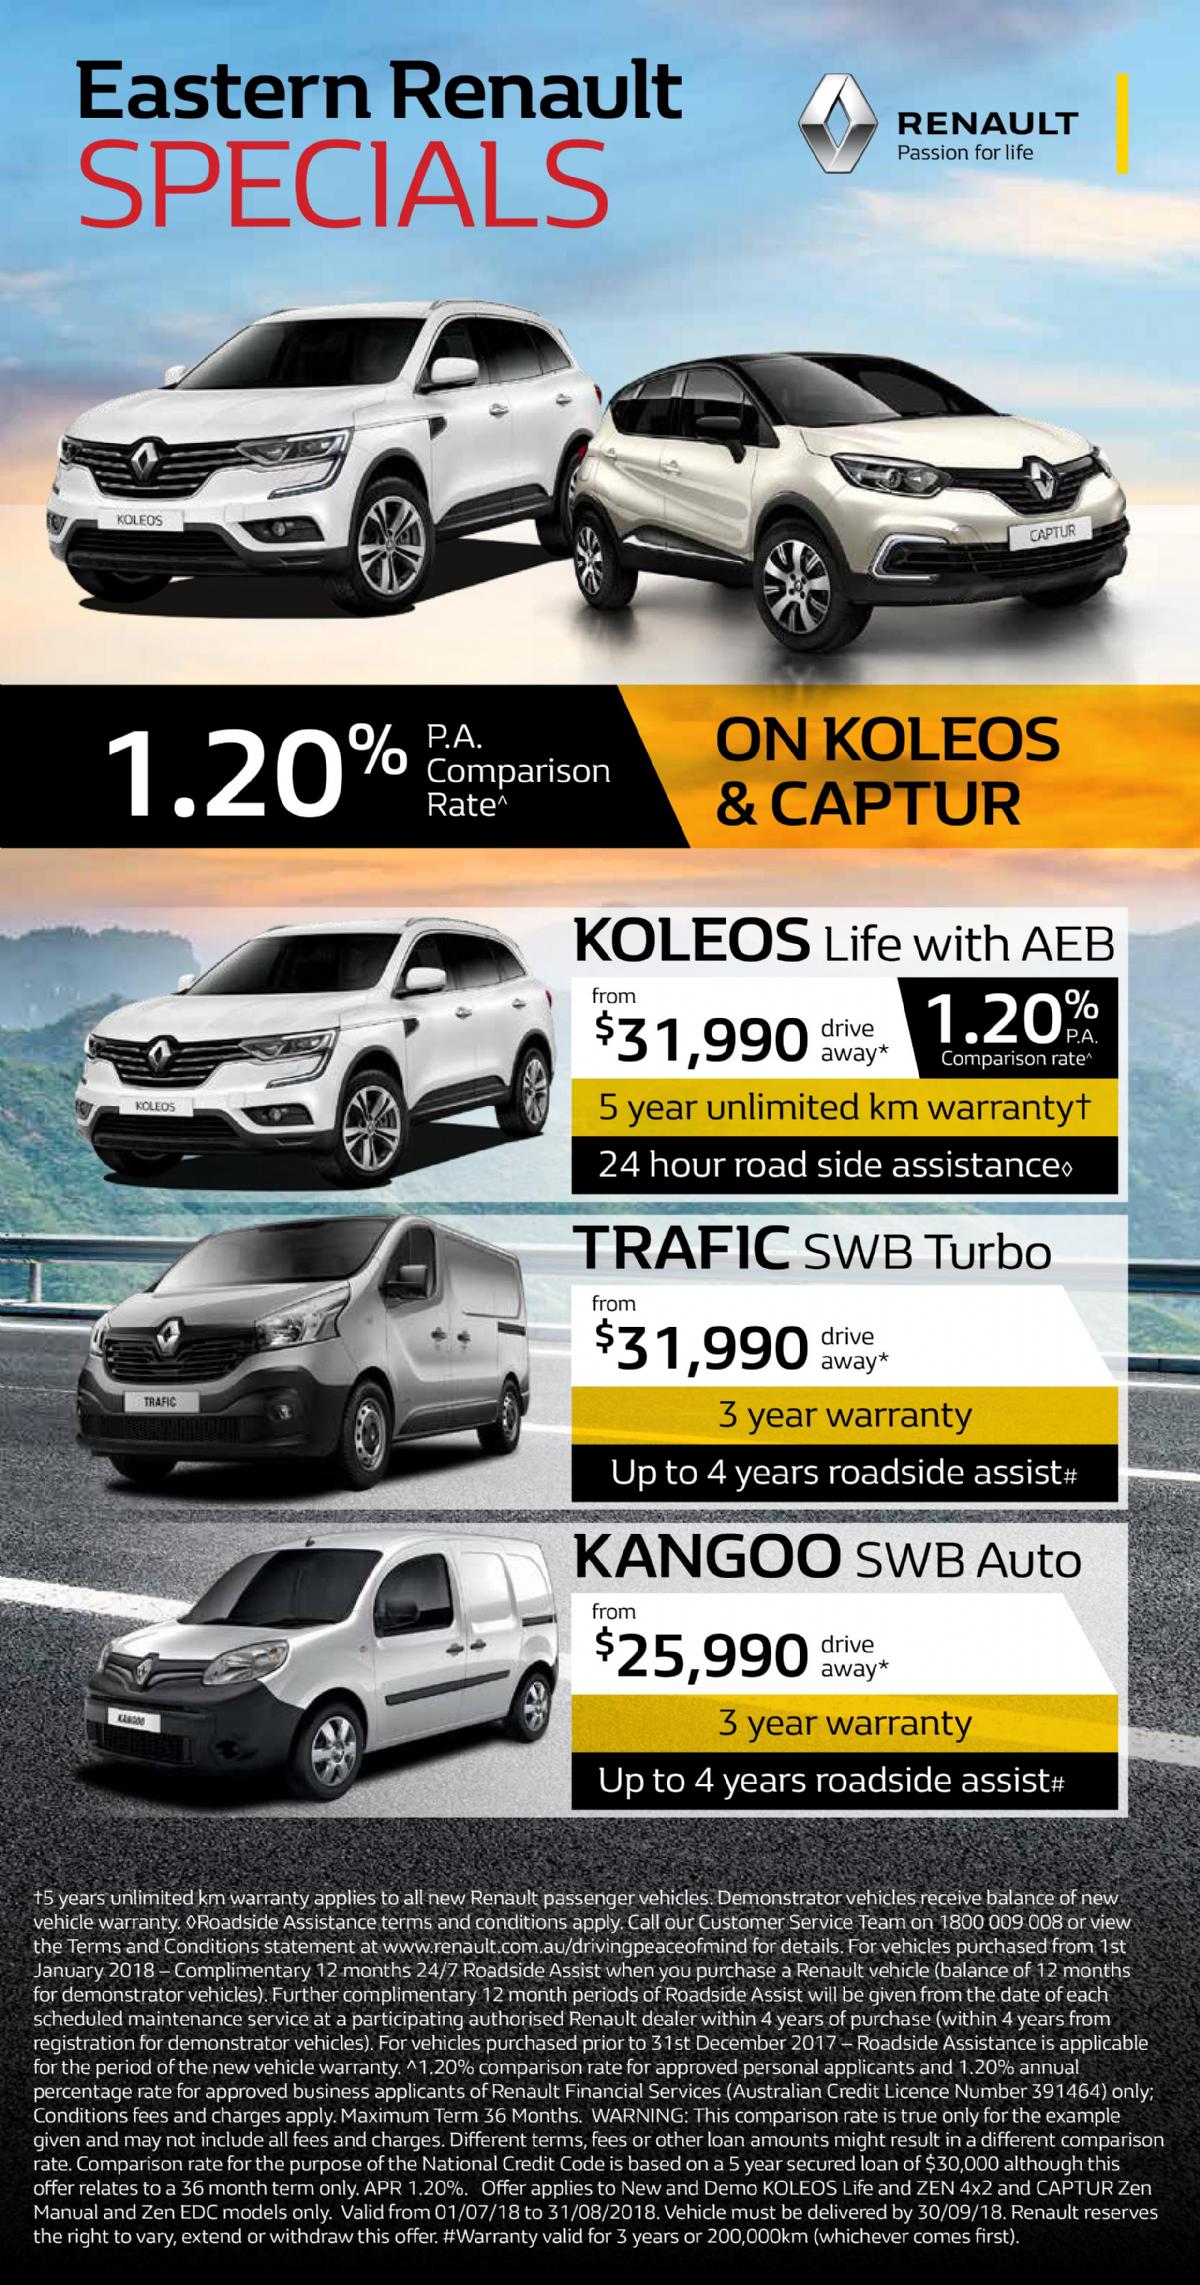 Eastern Renault Specials - Koleos & Captur